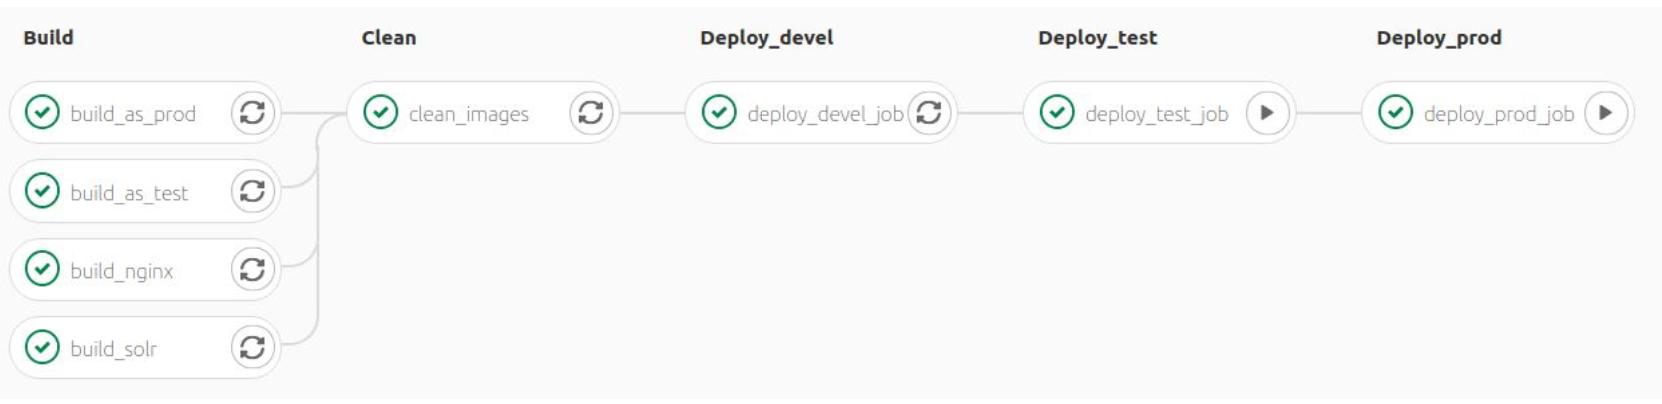 GitLab CI/CD deployment workflow